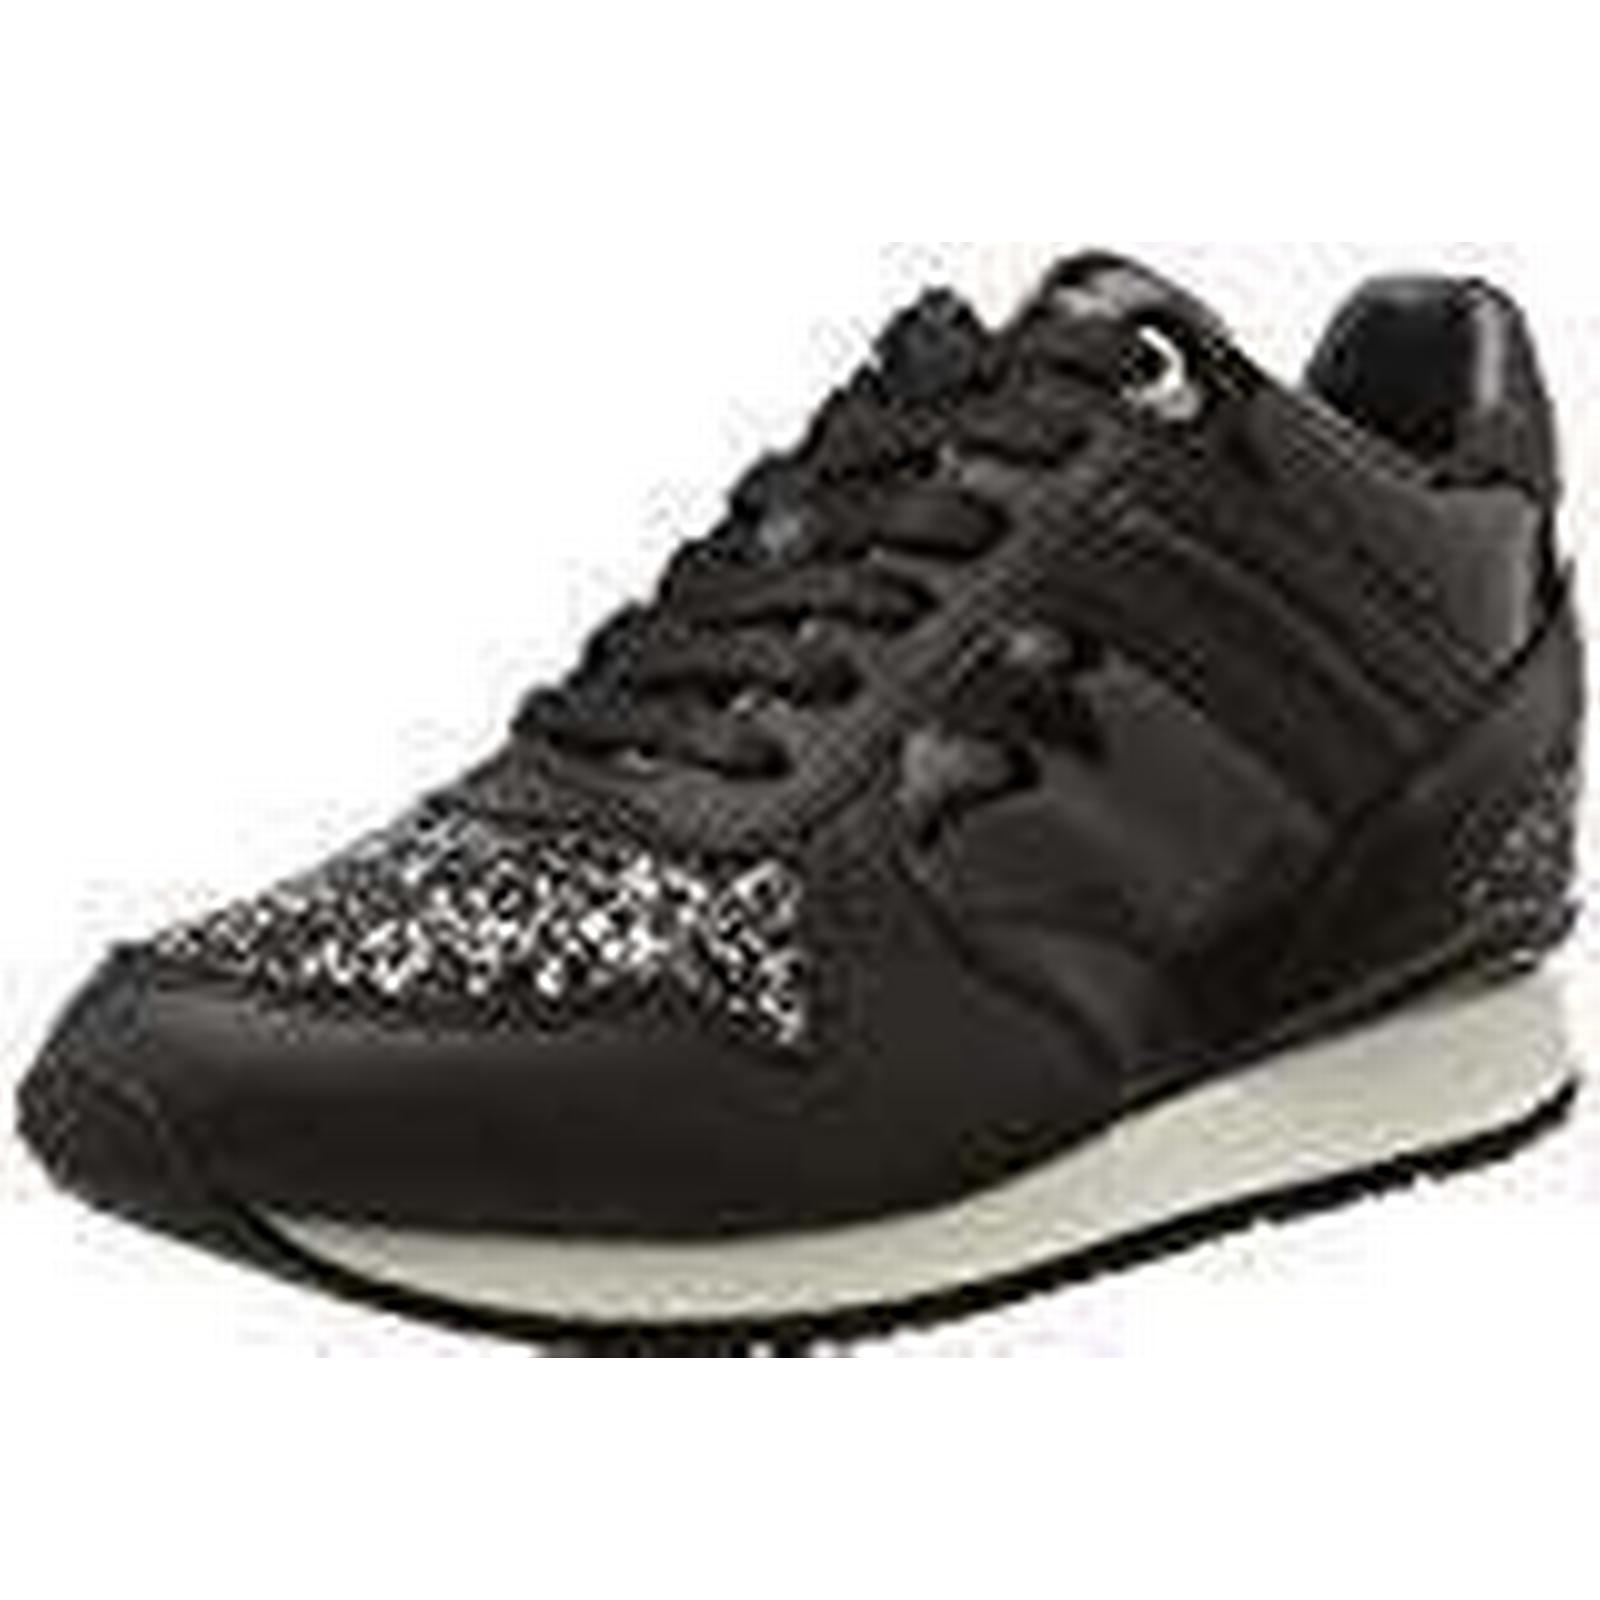 Tommy Hilfiger Women's S1285ady 13c2 UK Low-Top Sneakers, Black, 6.5 UK 13c2 f7a380